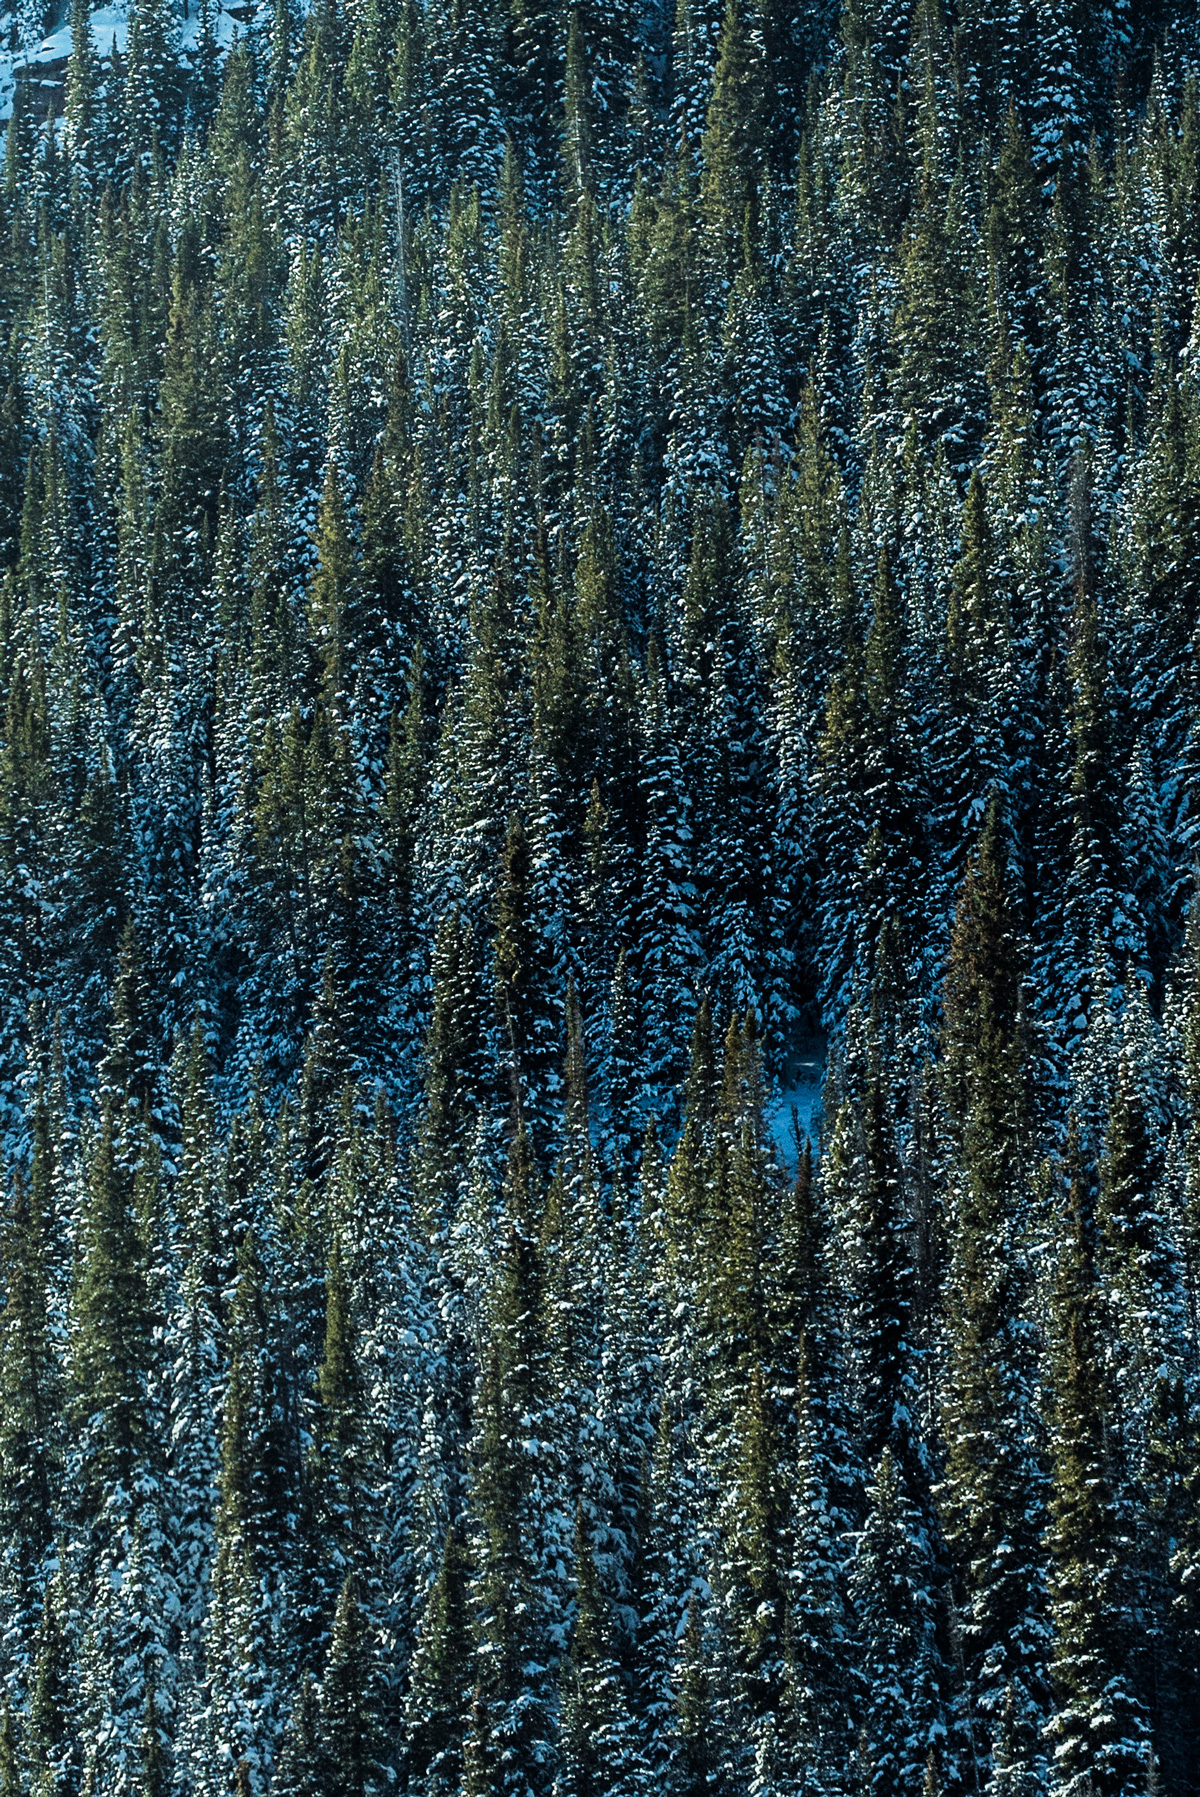 frozen_snow_tree_winter_colorado_alaska_green_branch.jpg